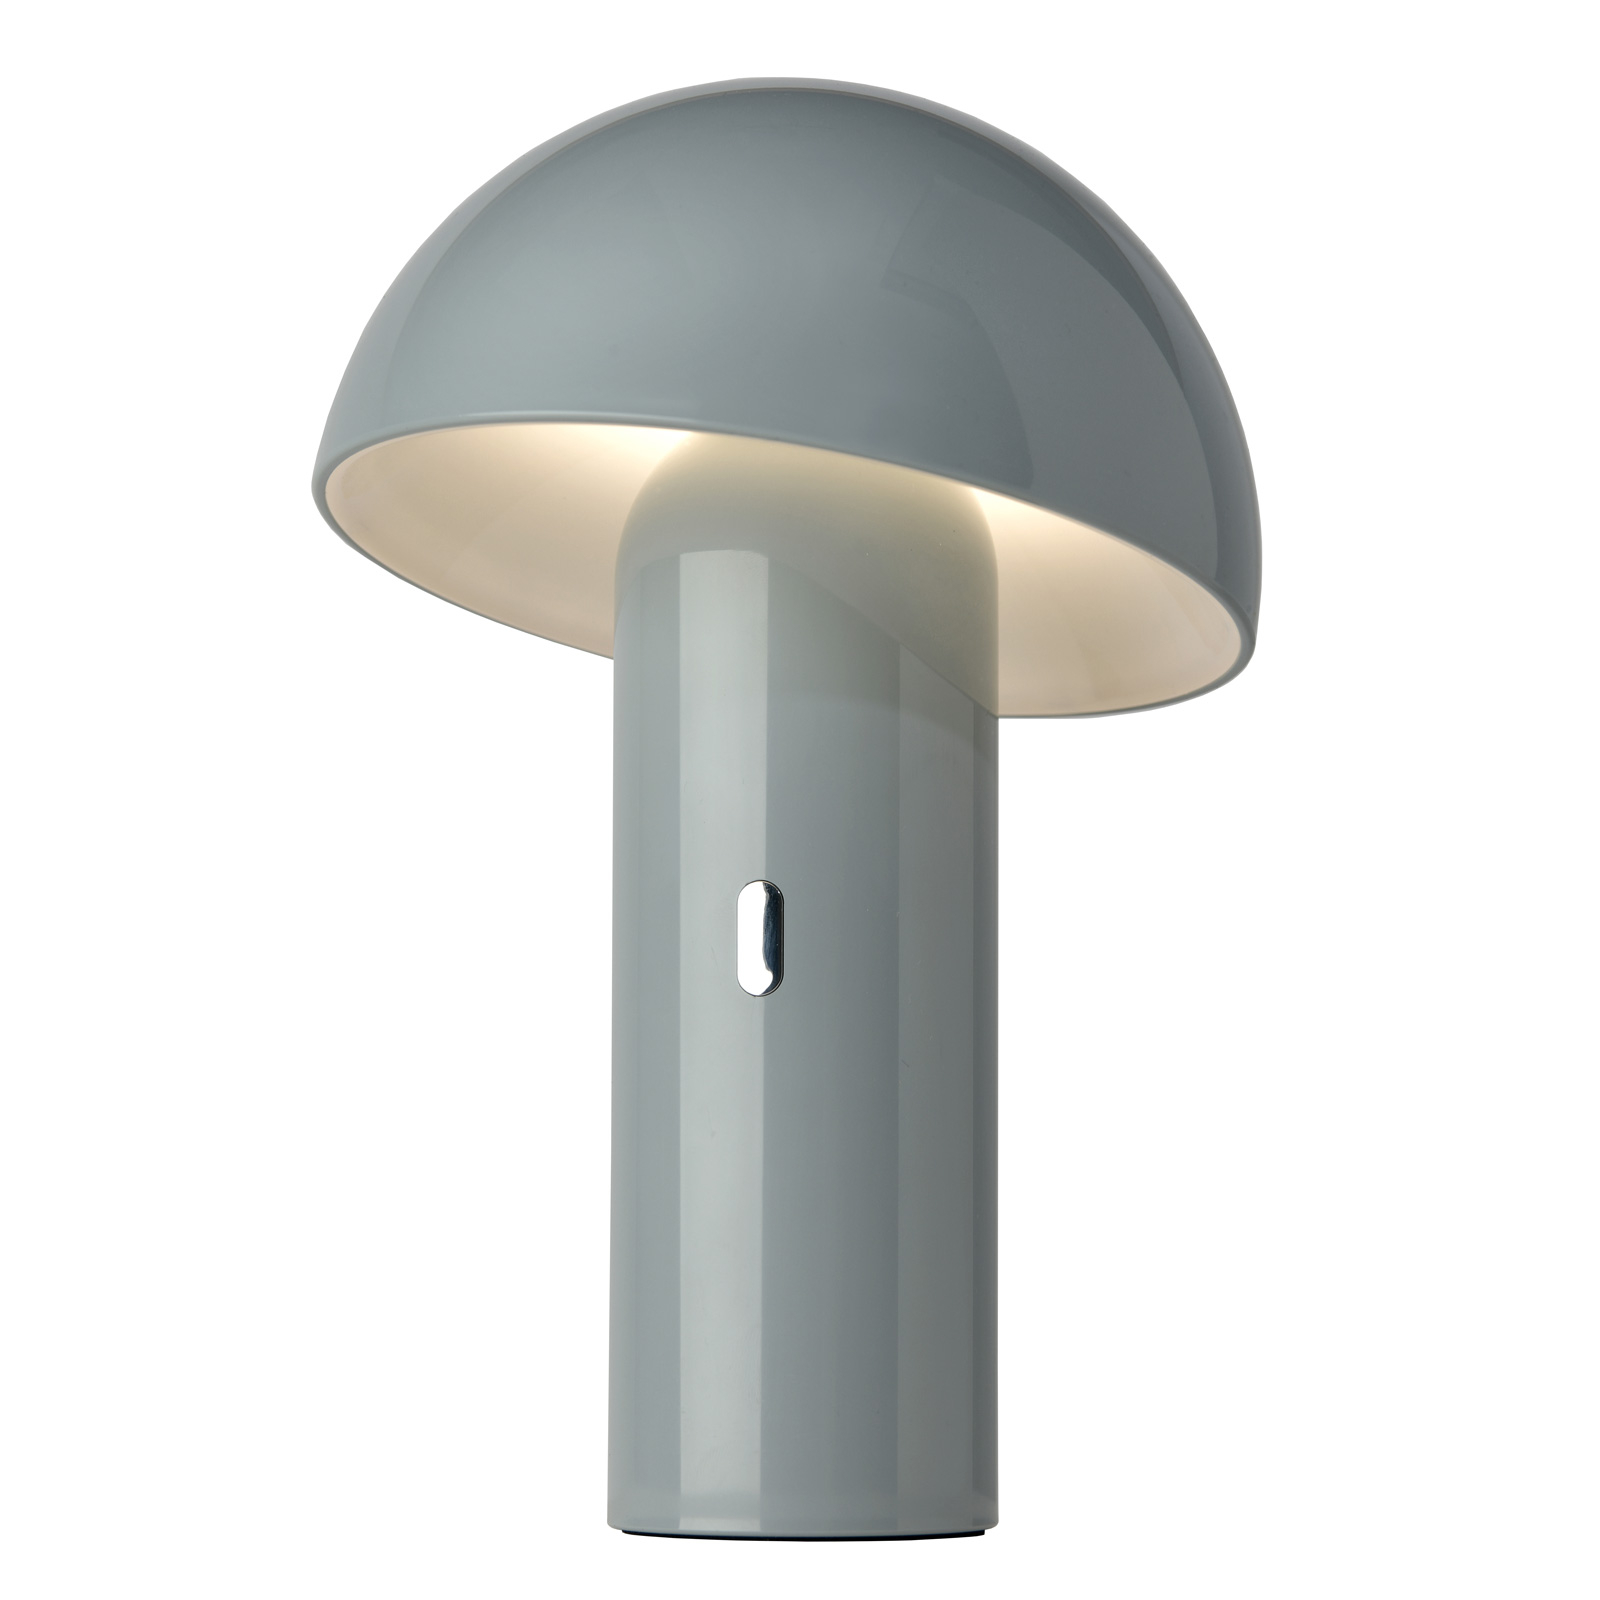 Lampe à poser LED Svamp batterie, pivotante, grise